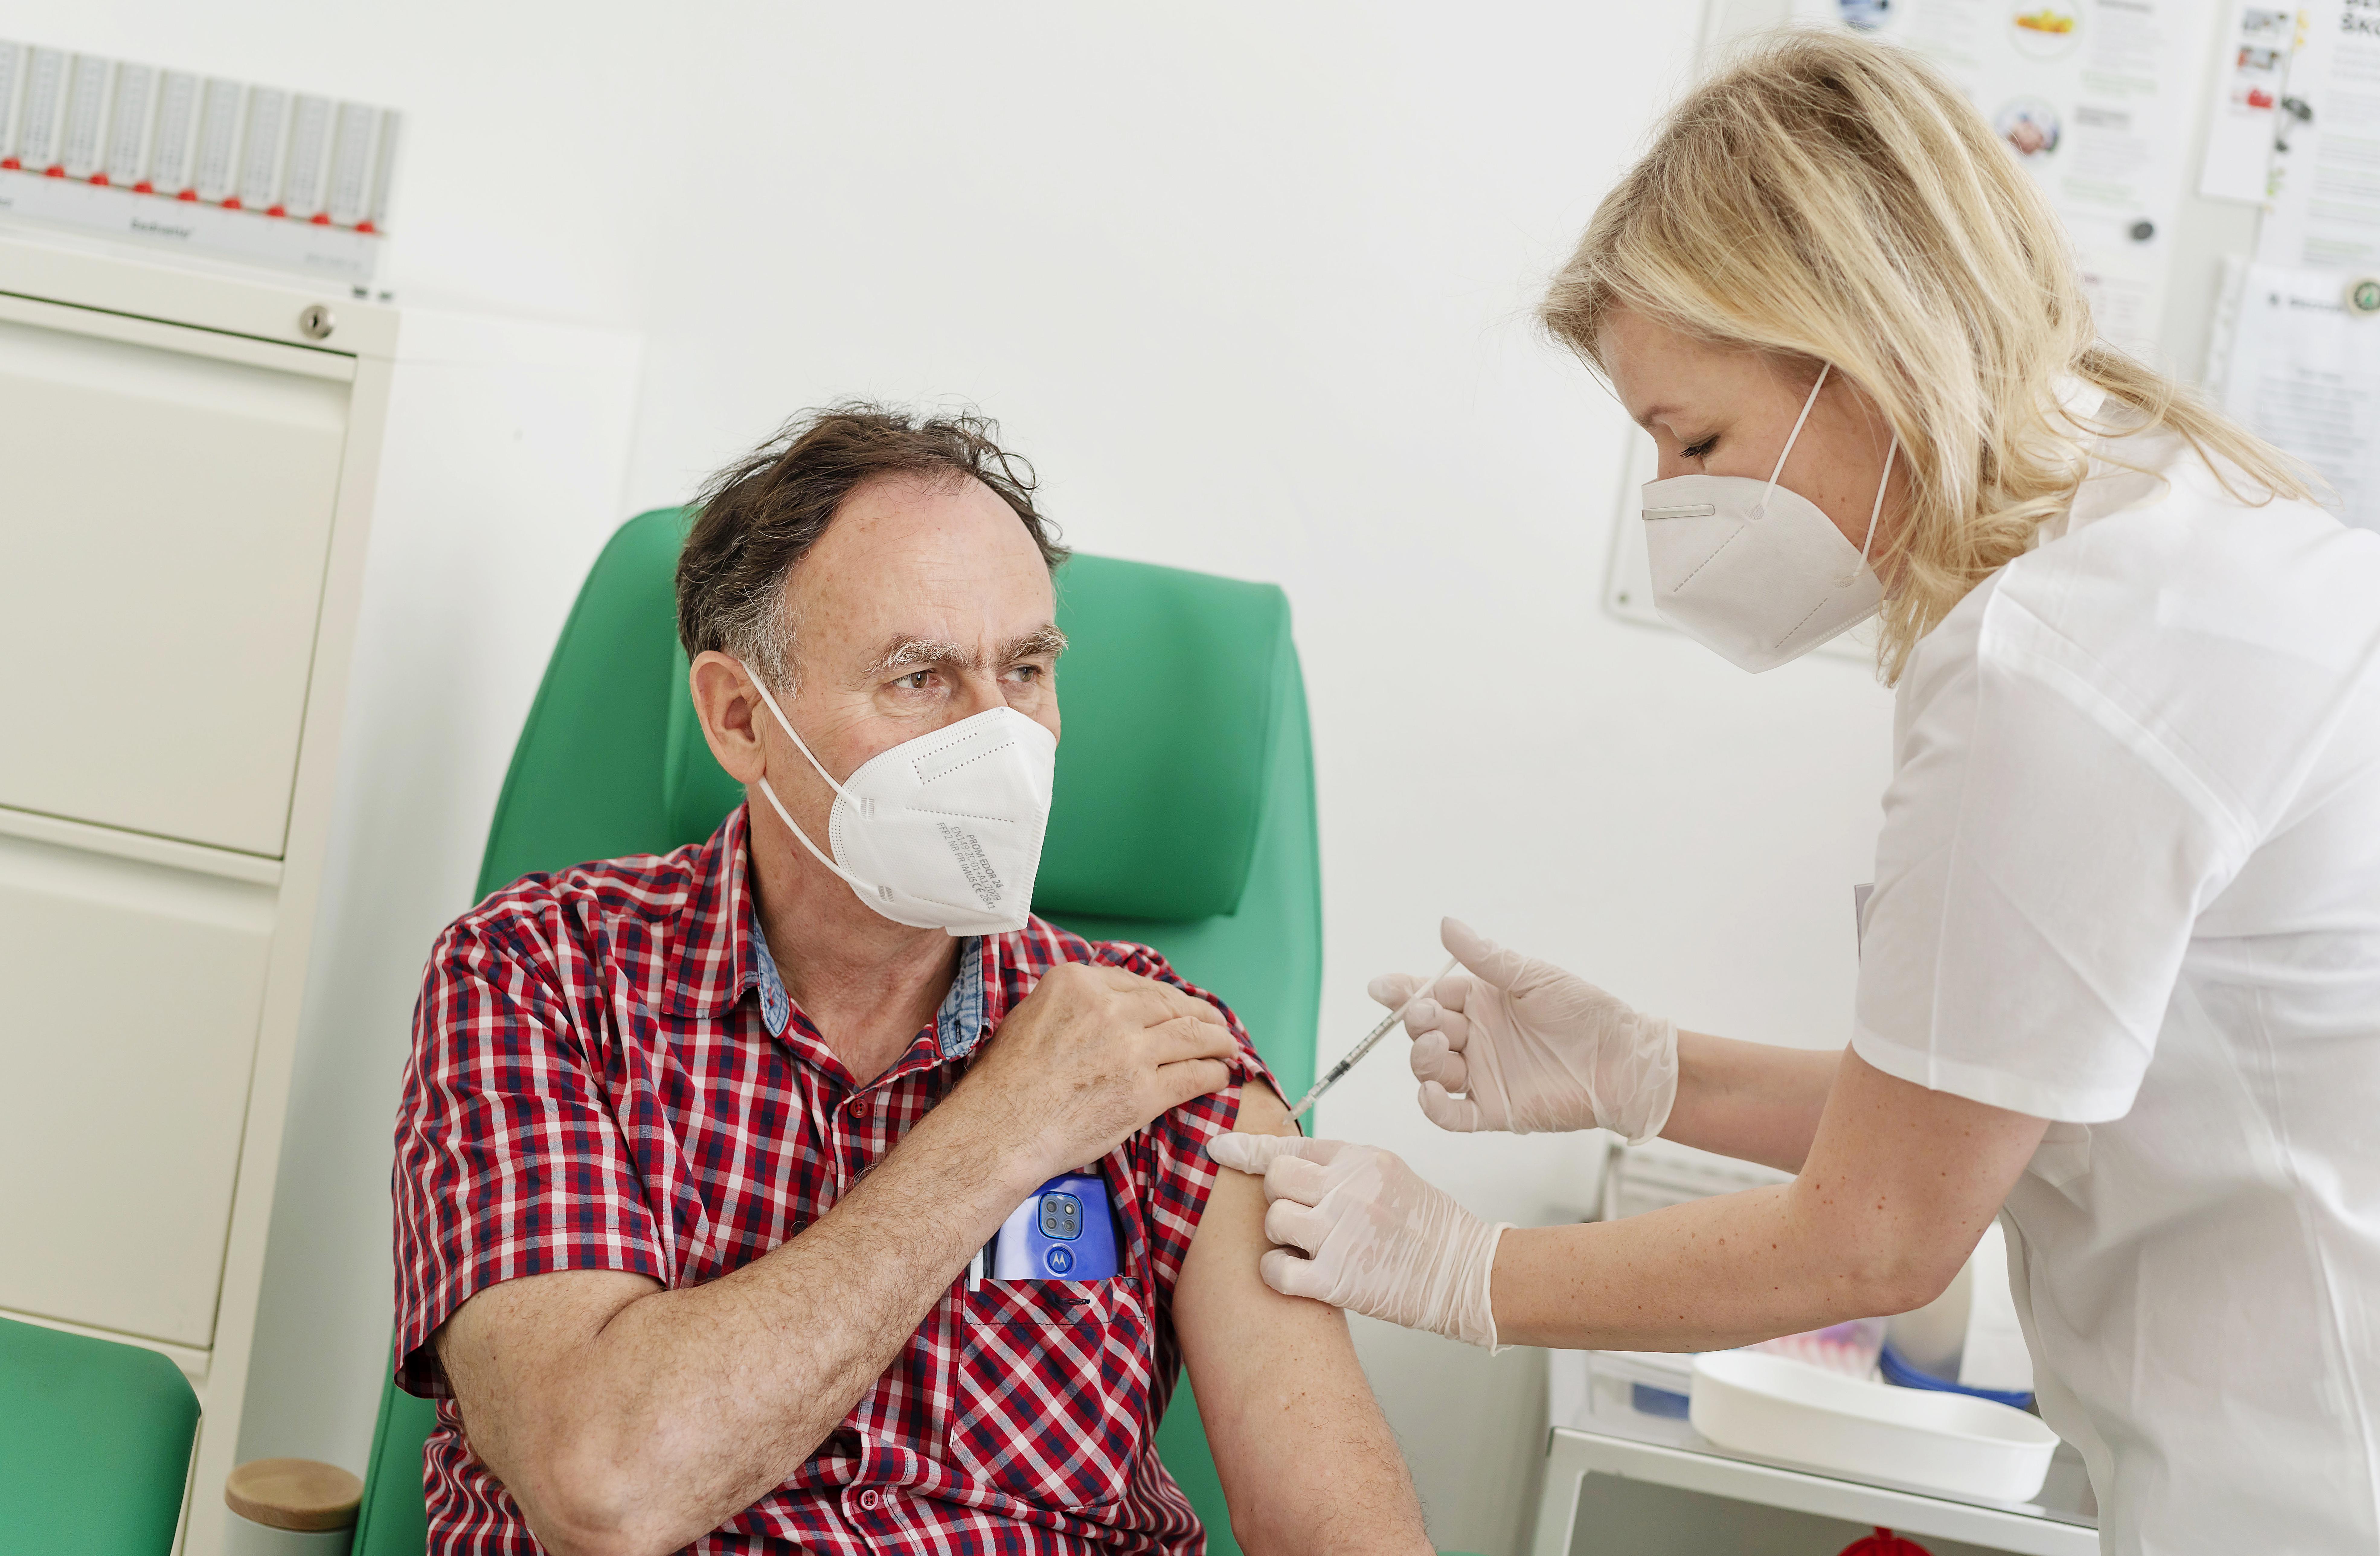 SKODA AUTO supports COVID-19 vaccination efforts - Image 1